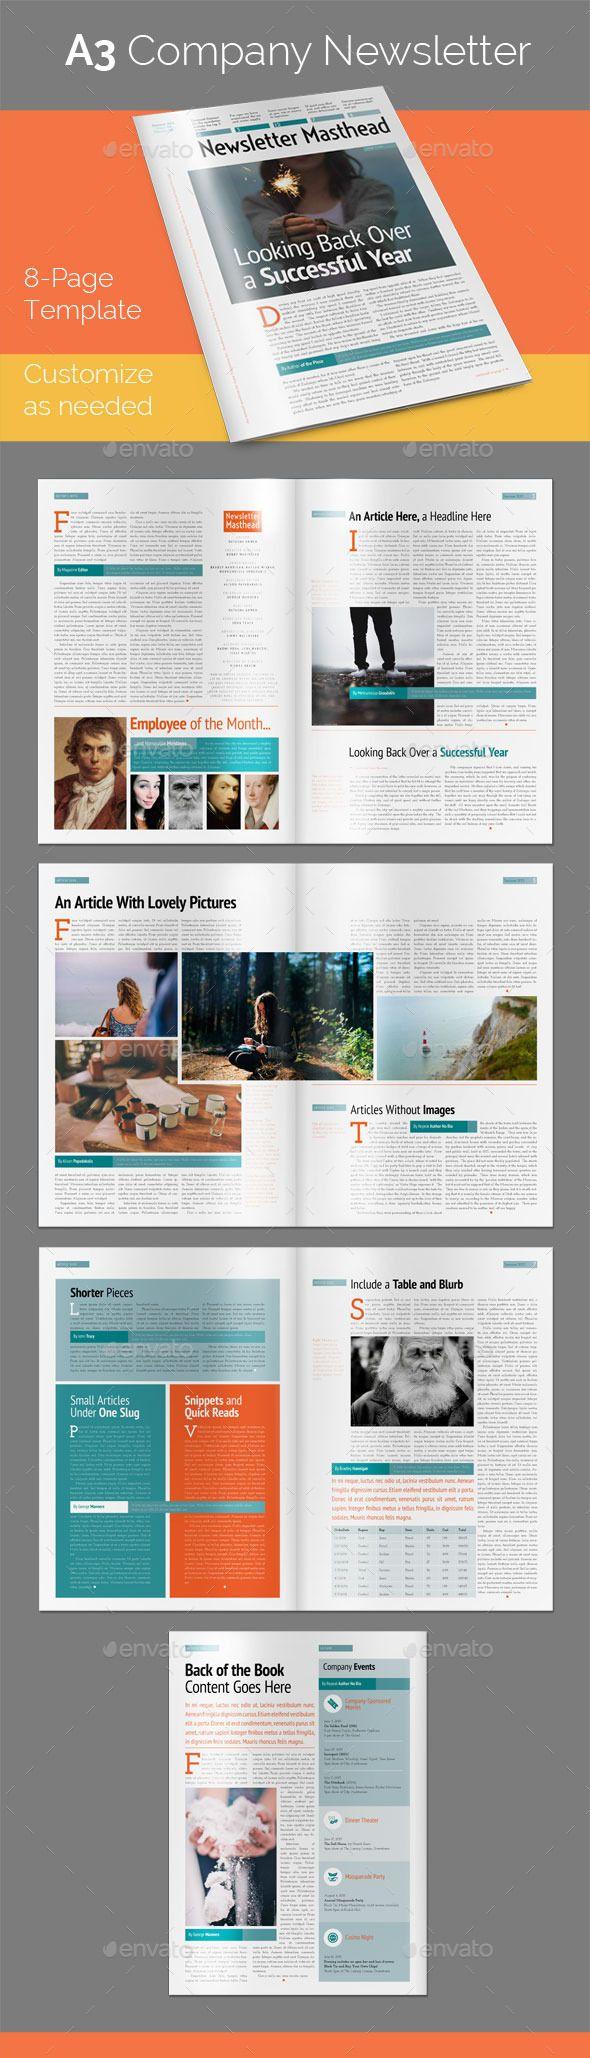 Best 25+ Newsletter design ideas on Pinterest